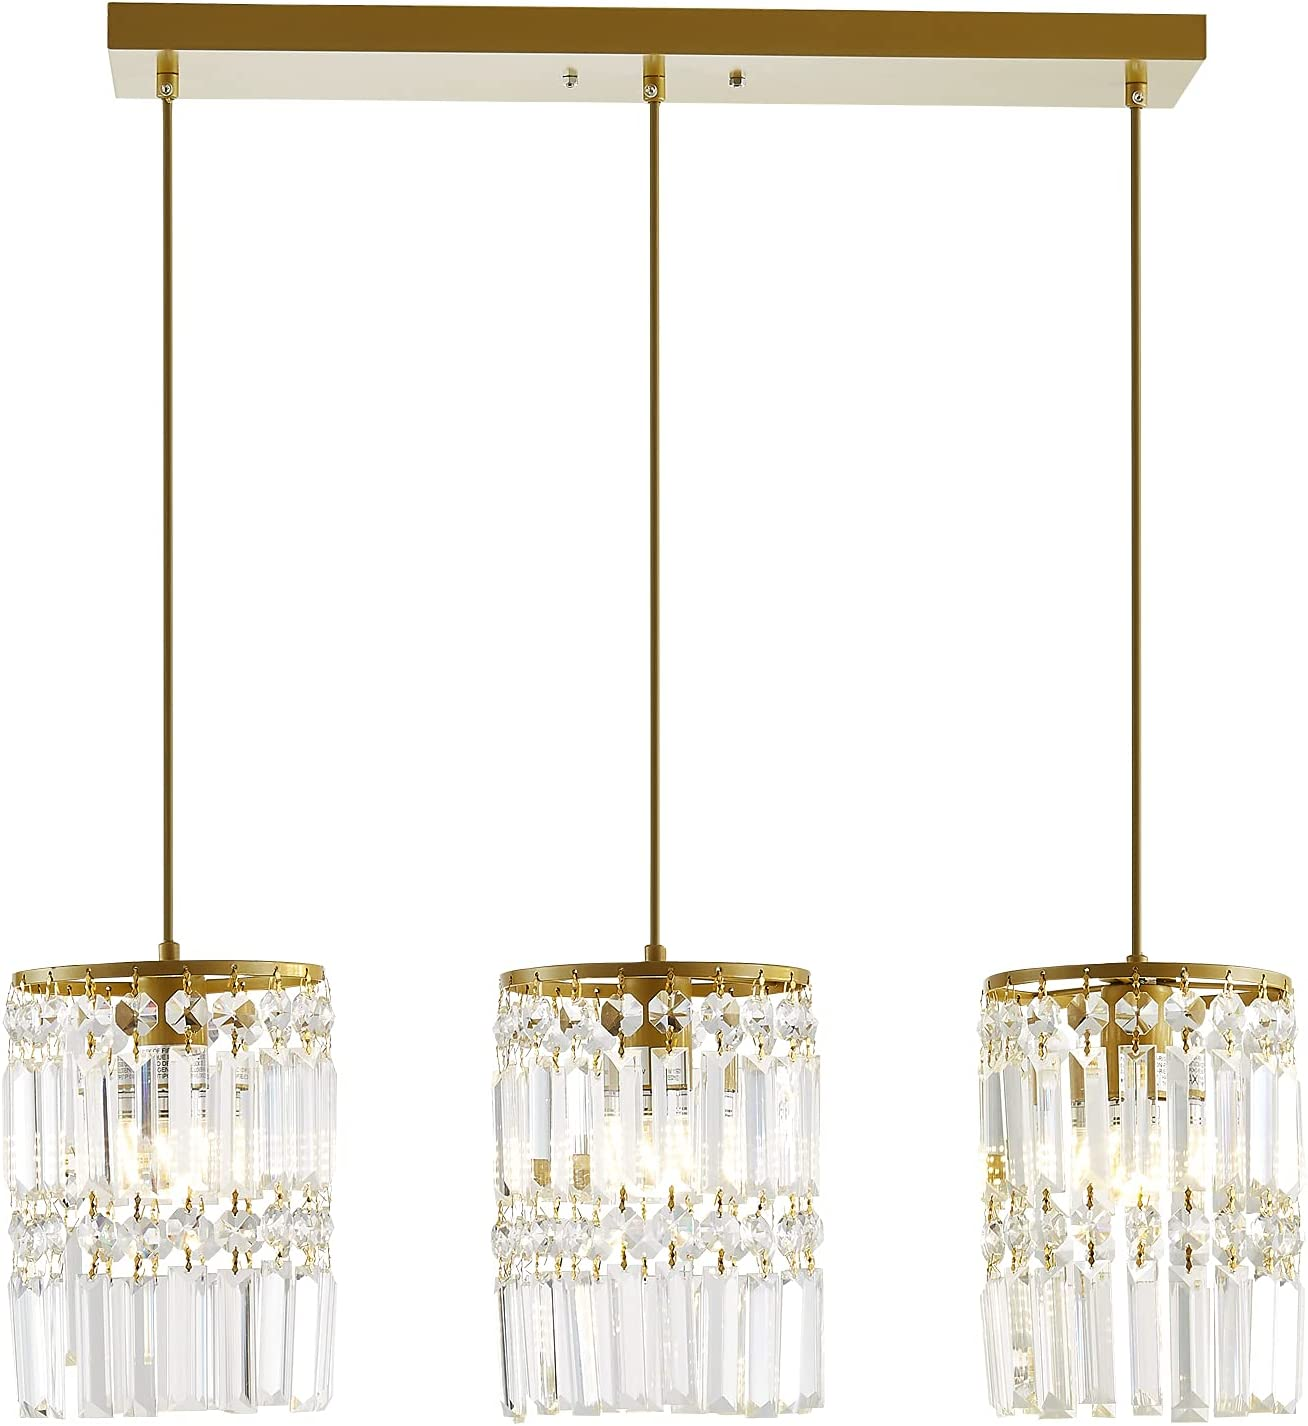 3 Light Pendant Lighting Modern Gold Crystal Ceiling Pendant Lighting, Mini Crystal Chandeliers,Adjustable Pendant Light Fixture for Kitchen Island Dinning Room Bedroom